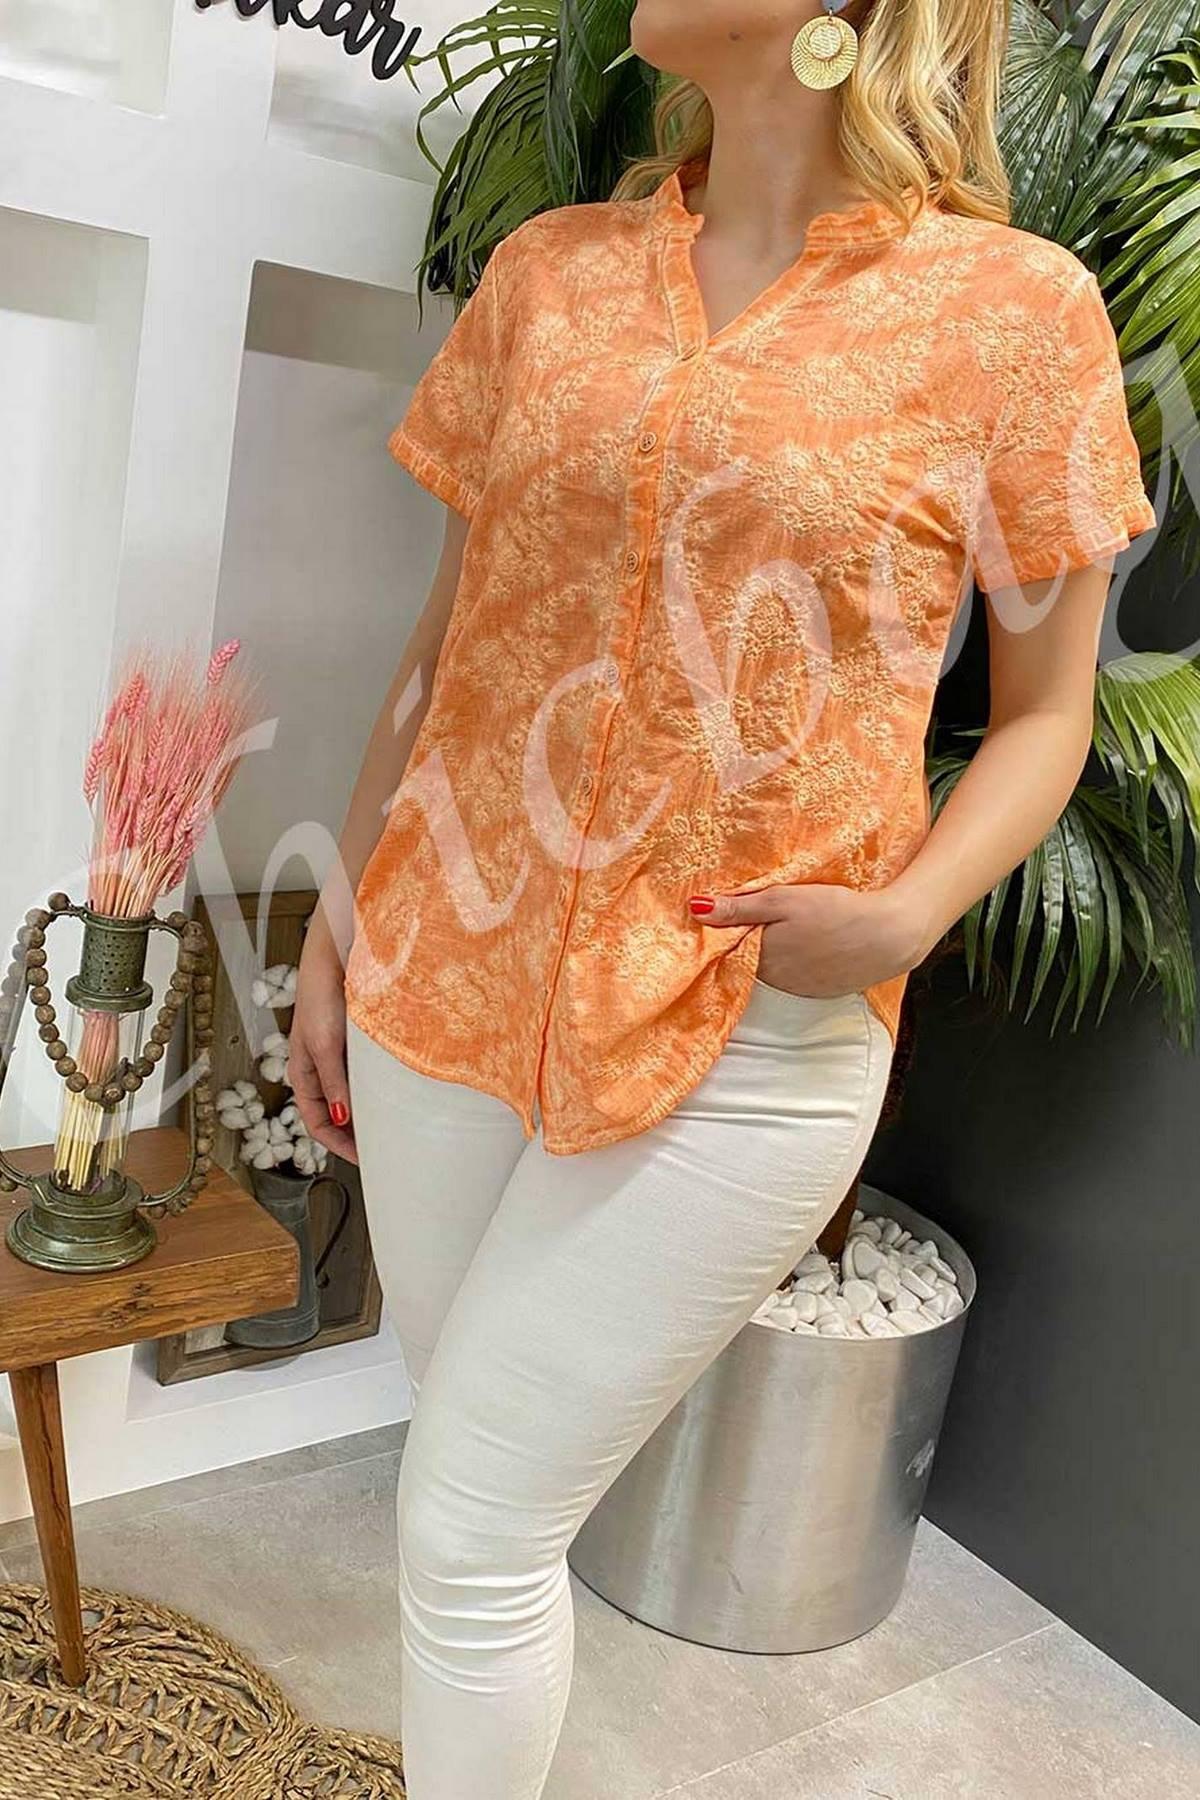 https://resim.chicbag.com.tr/p000860/yvr/batik-kendinden-islemeli-gomlek-orgm-01e46e348f0b.